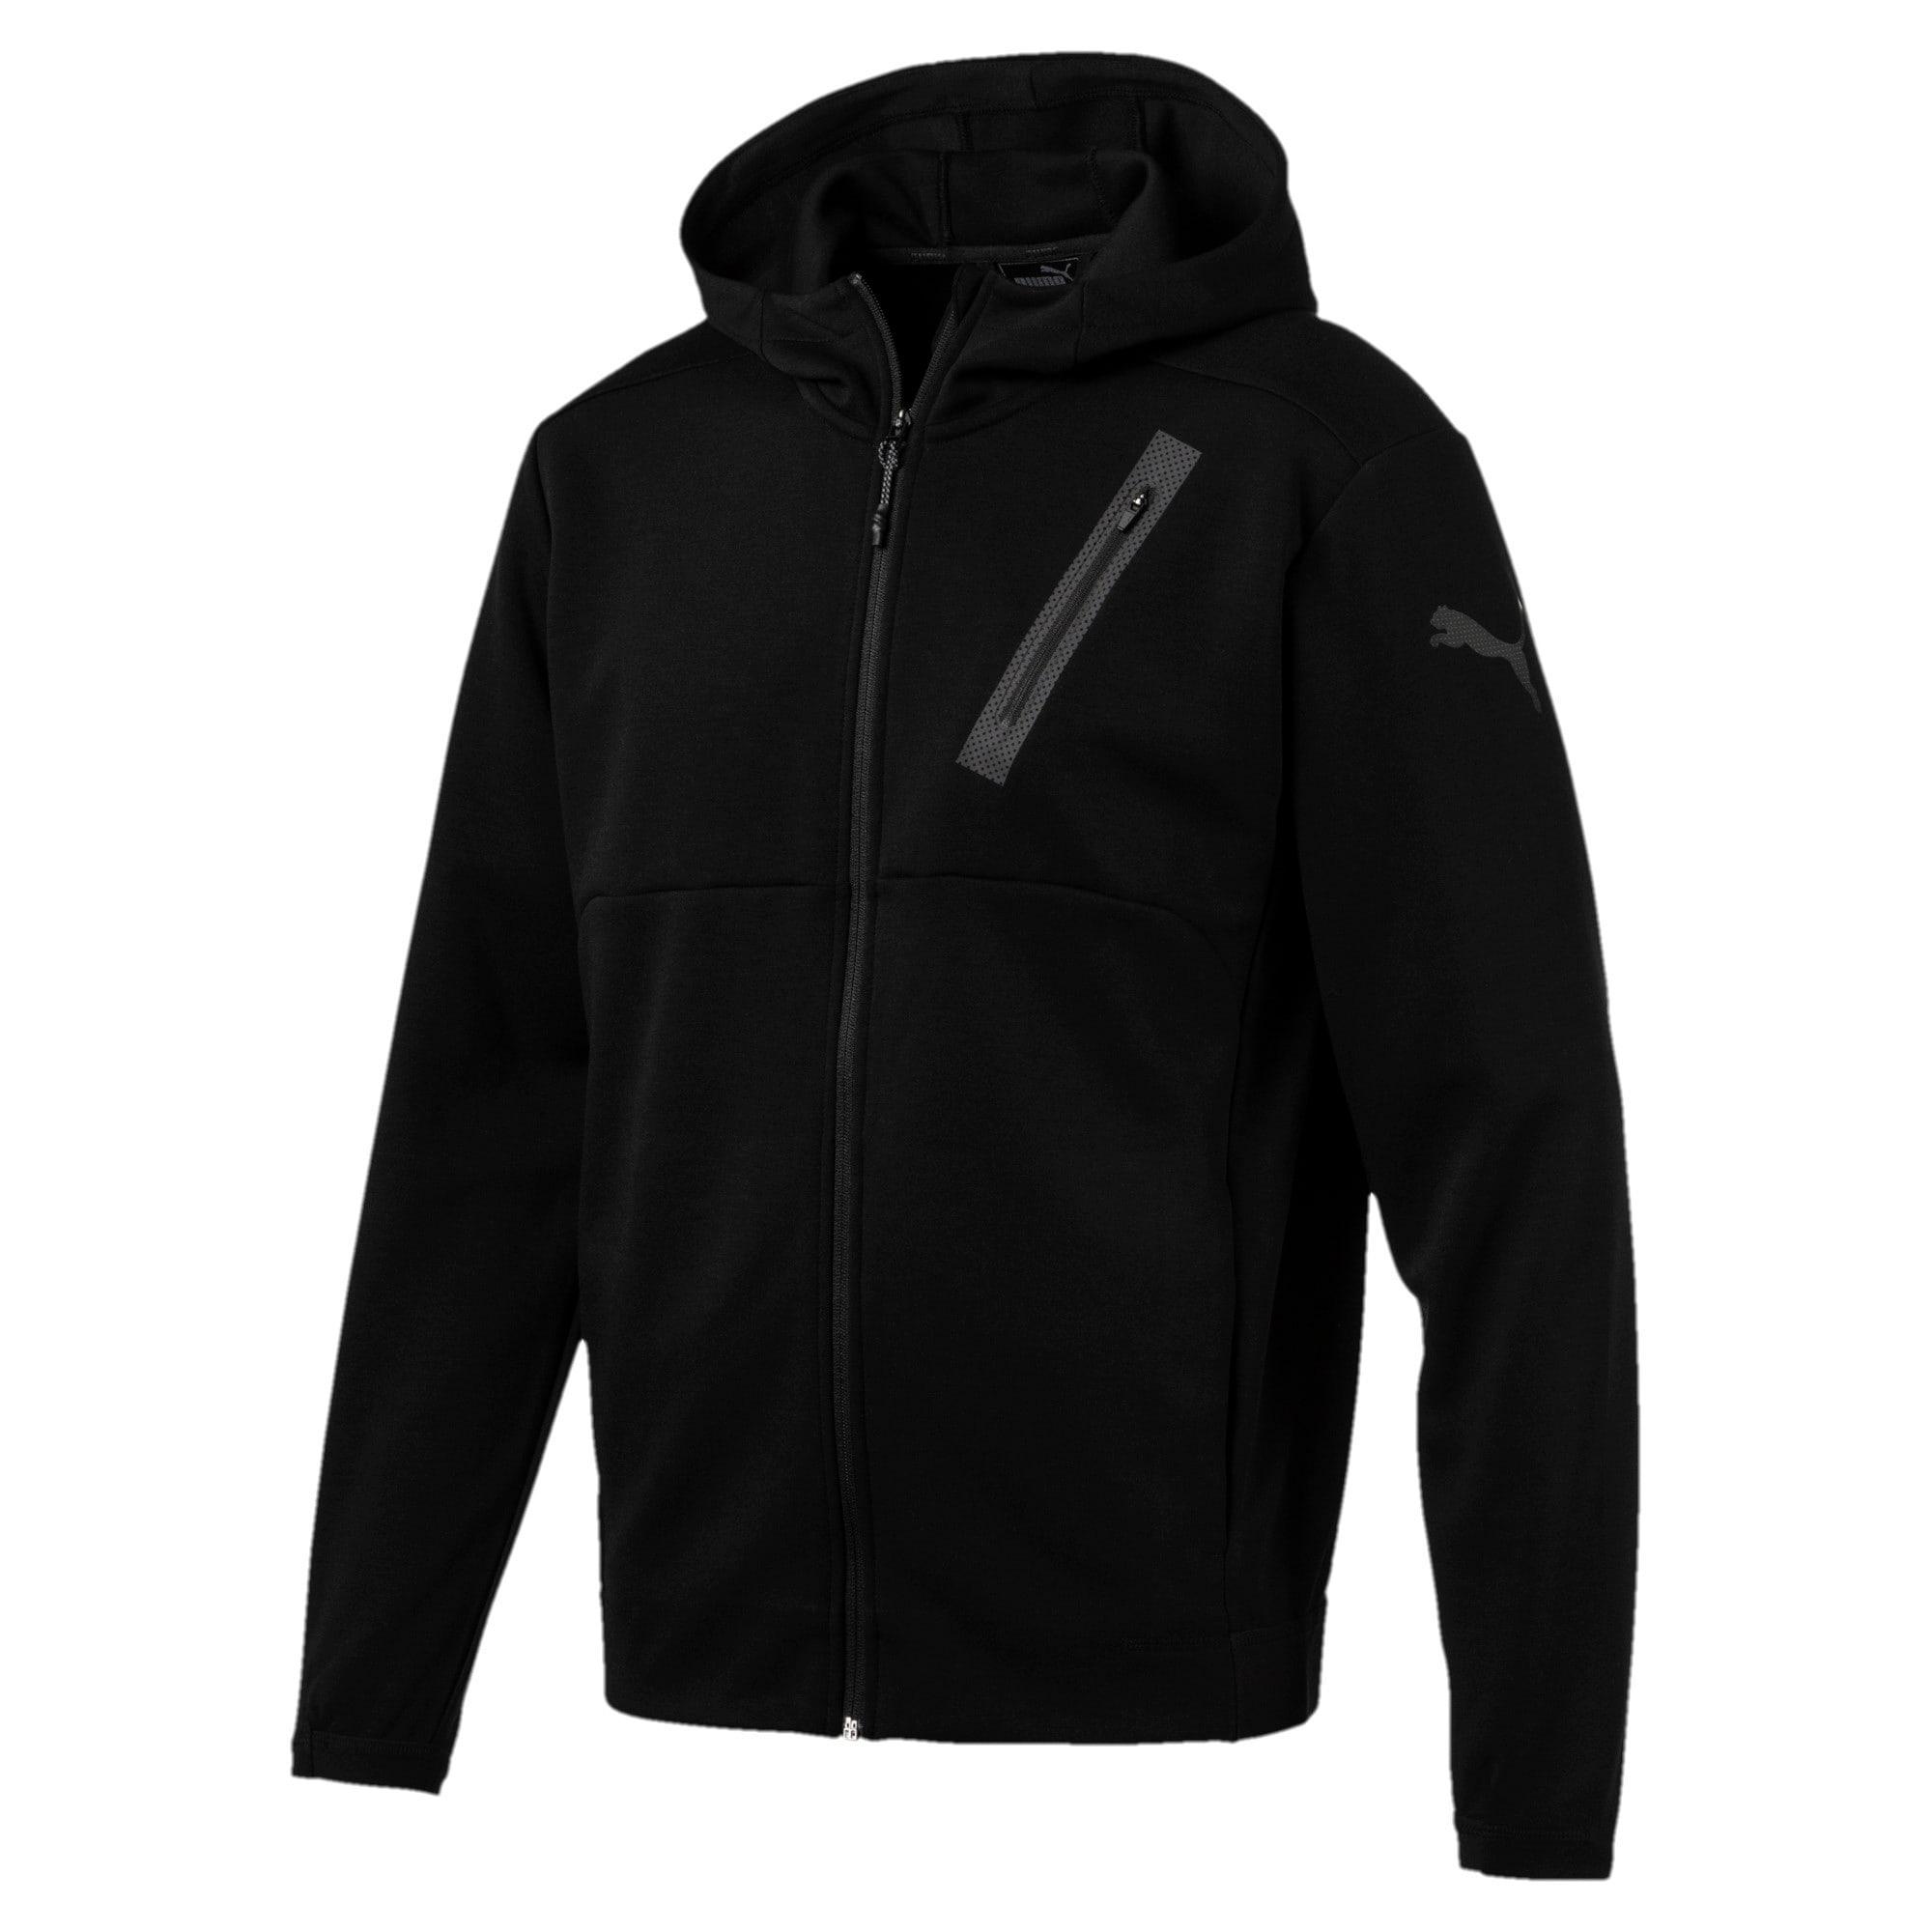 Thumbnail 1 of Active Training Men's Bonded Tech Jacket, Puma Black, medium-IND